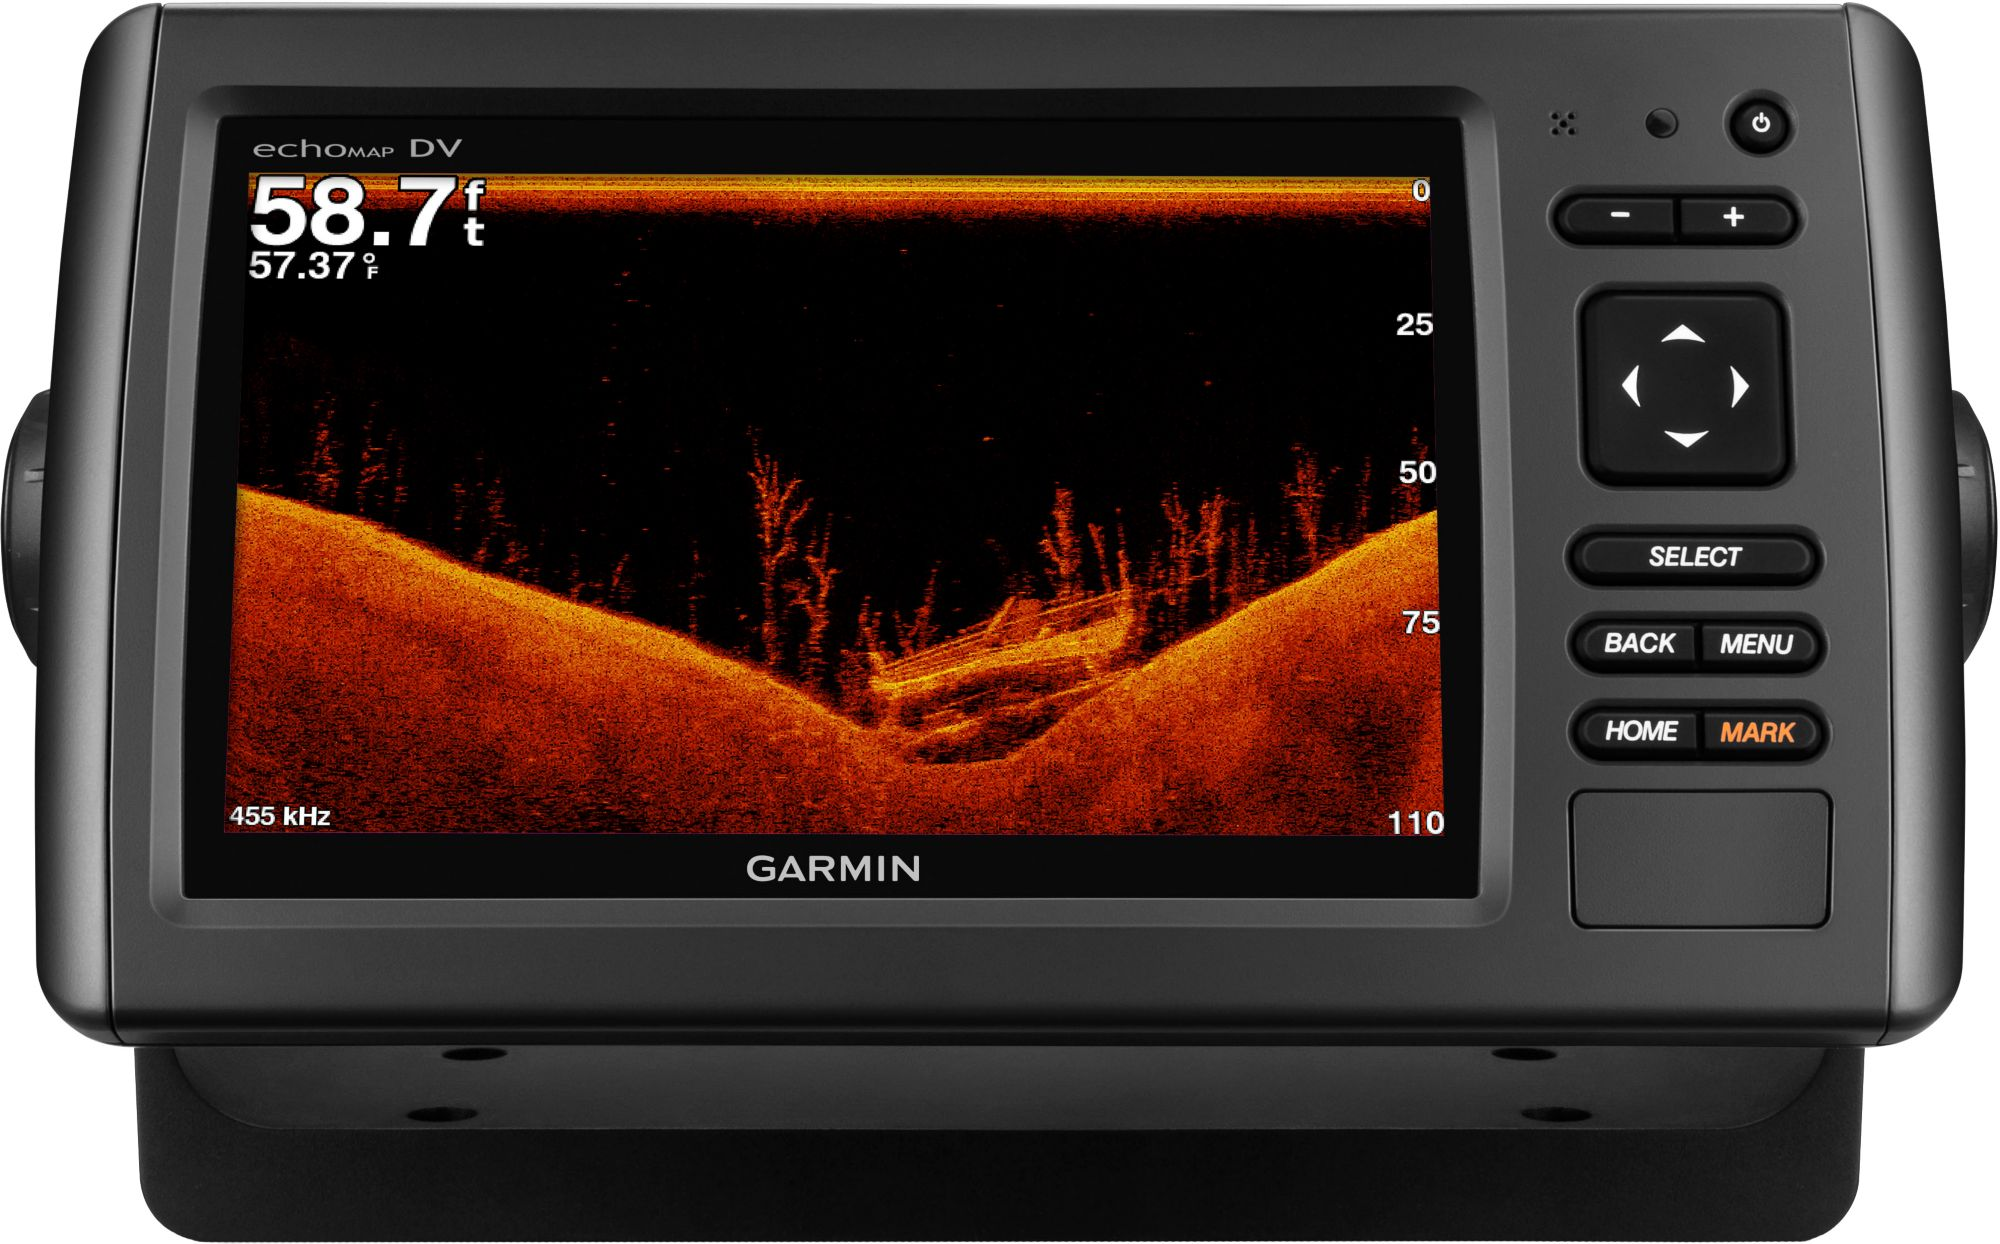 Garmin echoMAP 73dv GPS Fish Finder Combo | Field & Stream